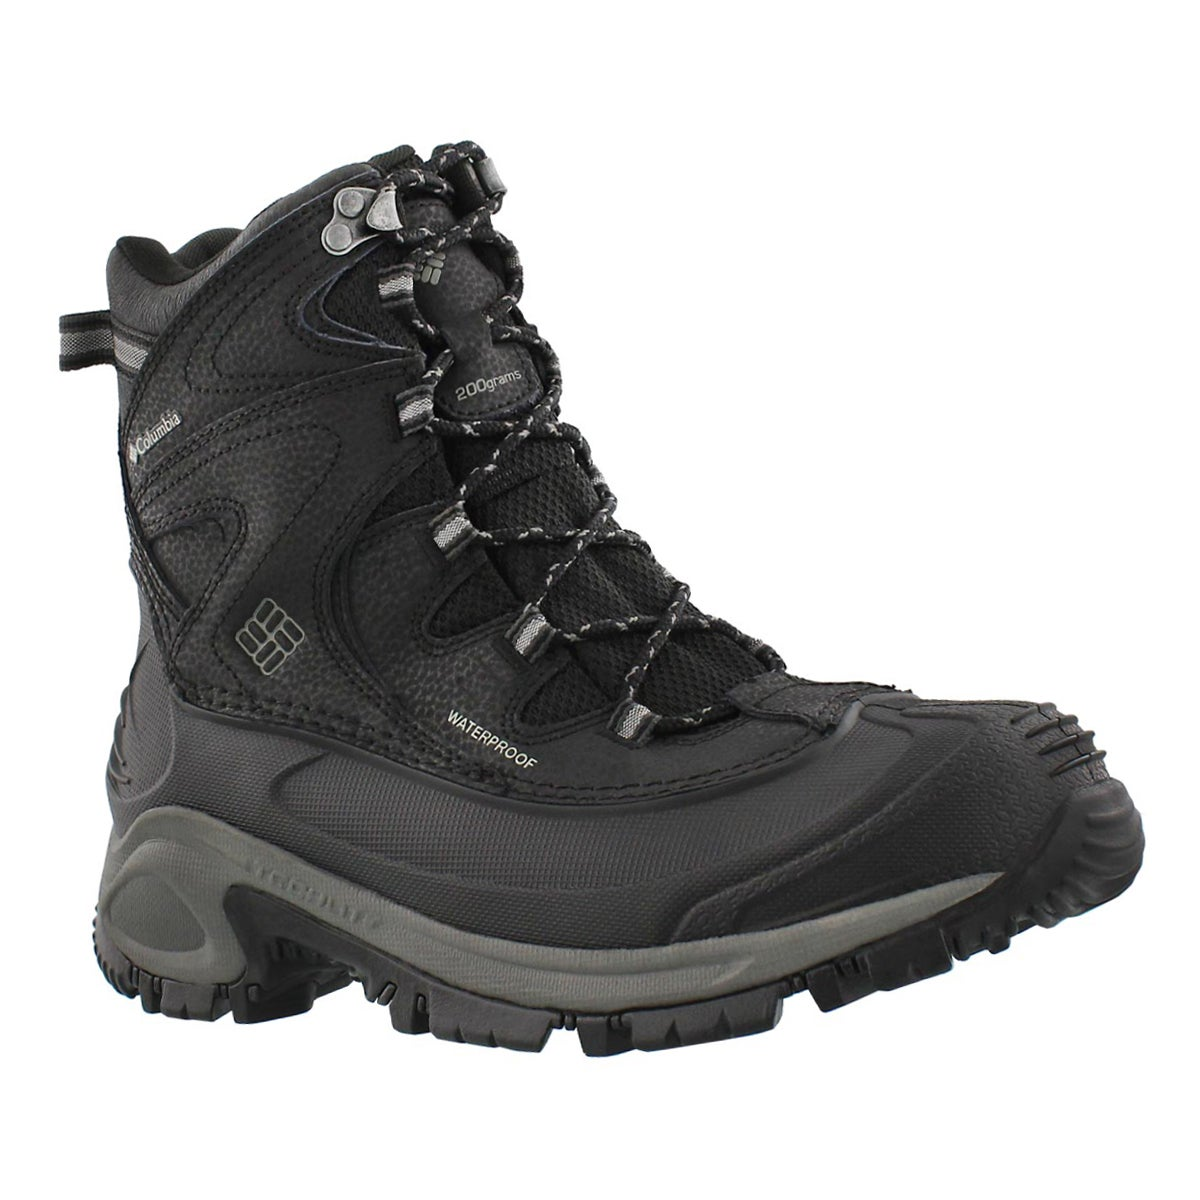 Women's BUGABOOT II black winter boots